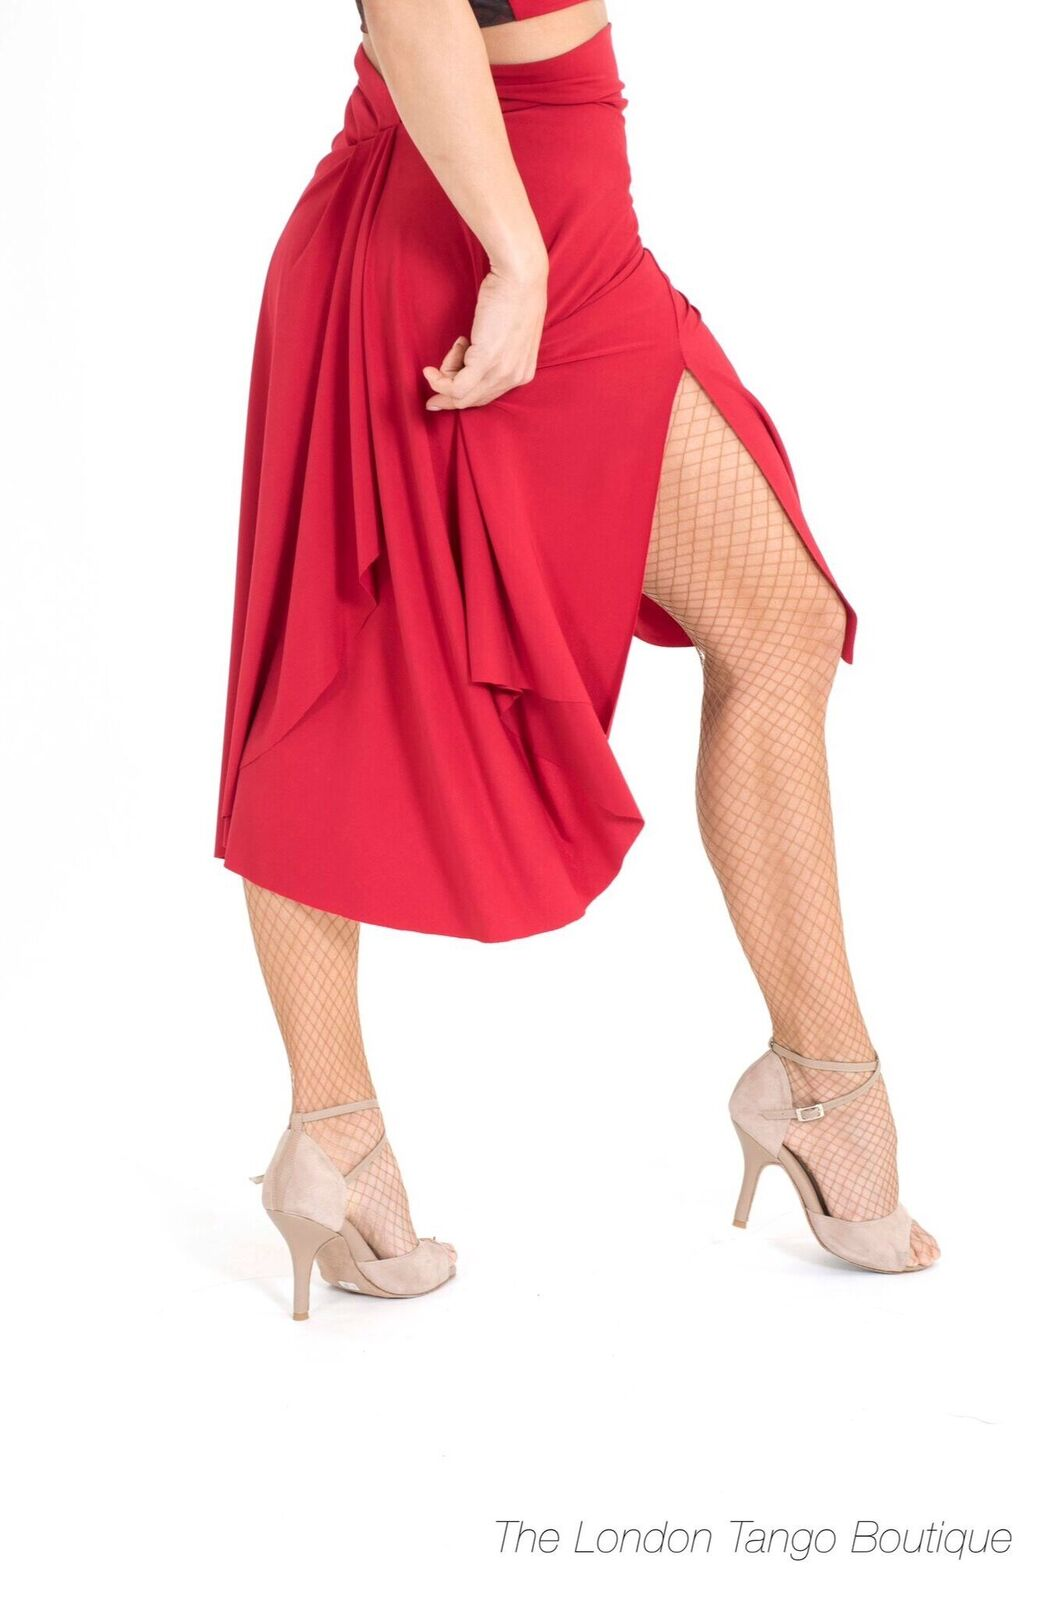 An elegant argentine tango skirt